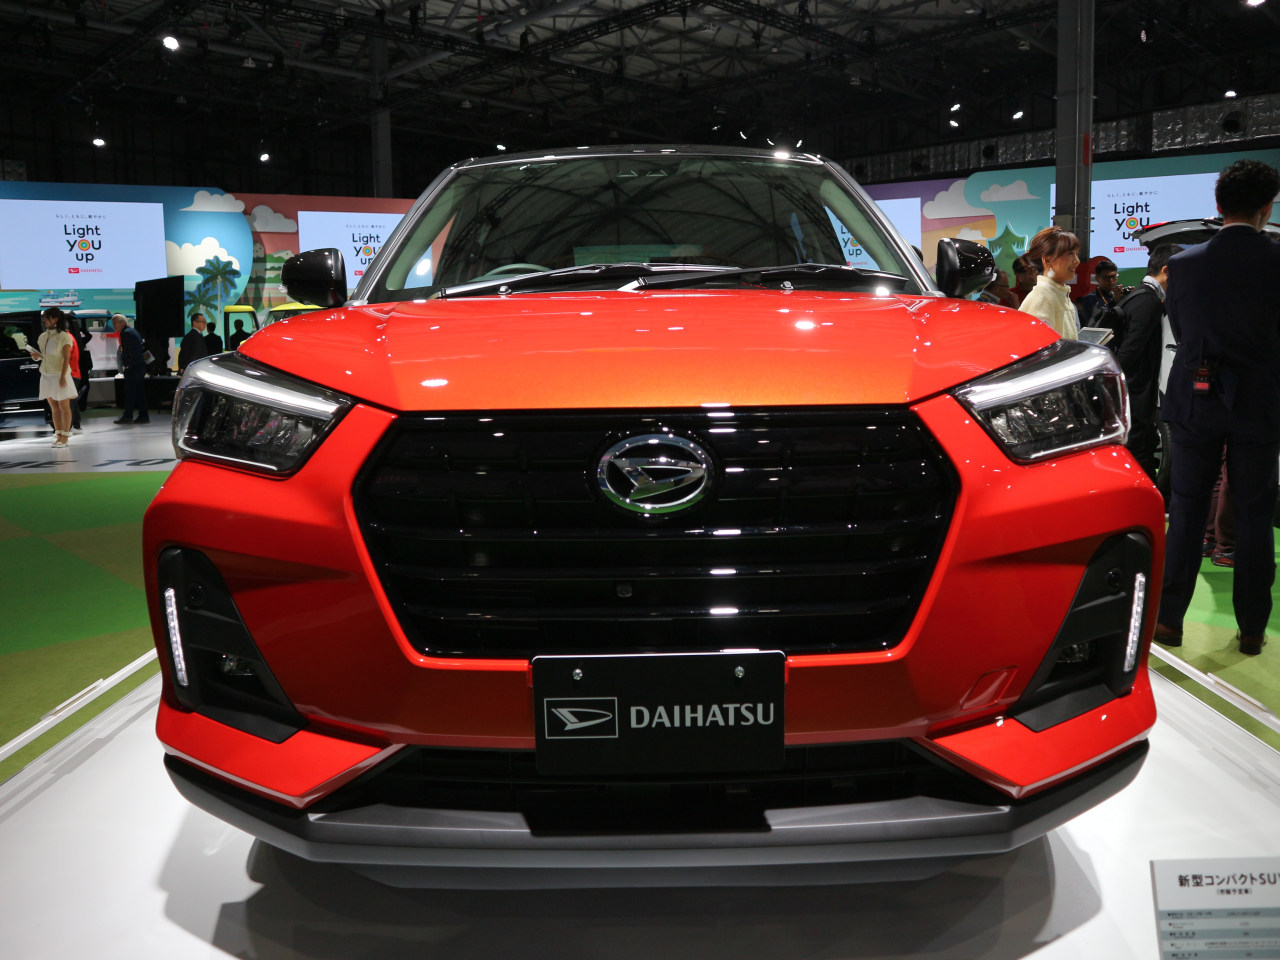 Otomotif, Daihatsu, Rocky,  Tokyo Motor Show, SUV, Terios,